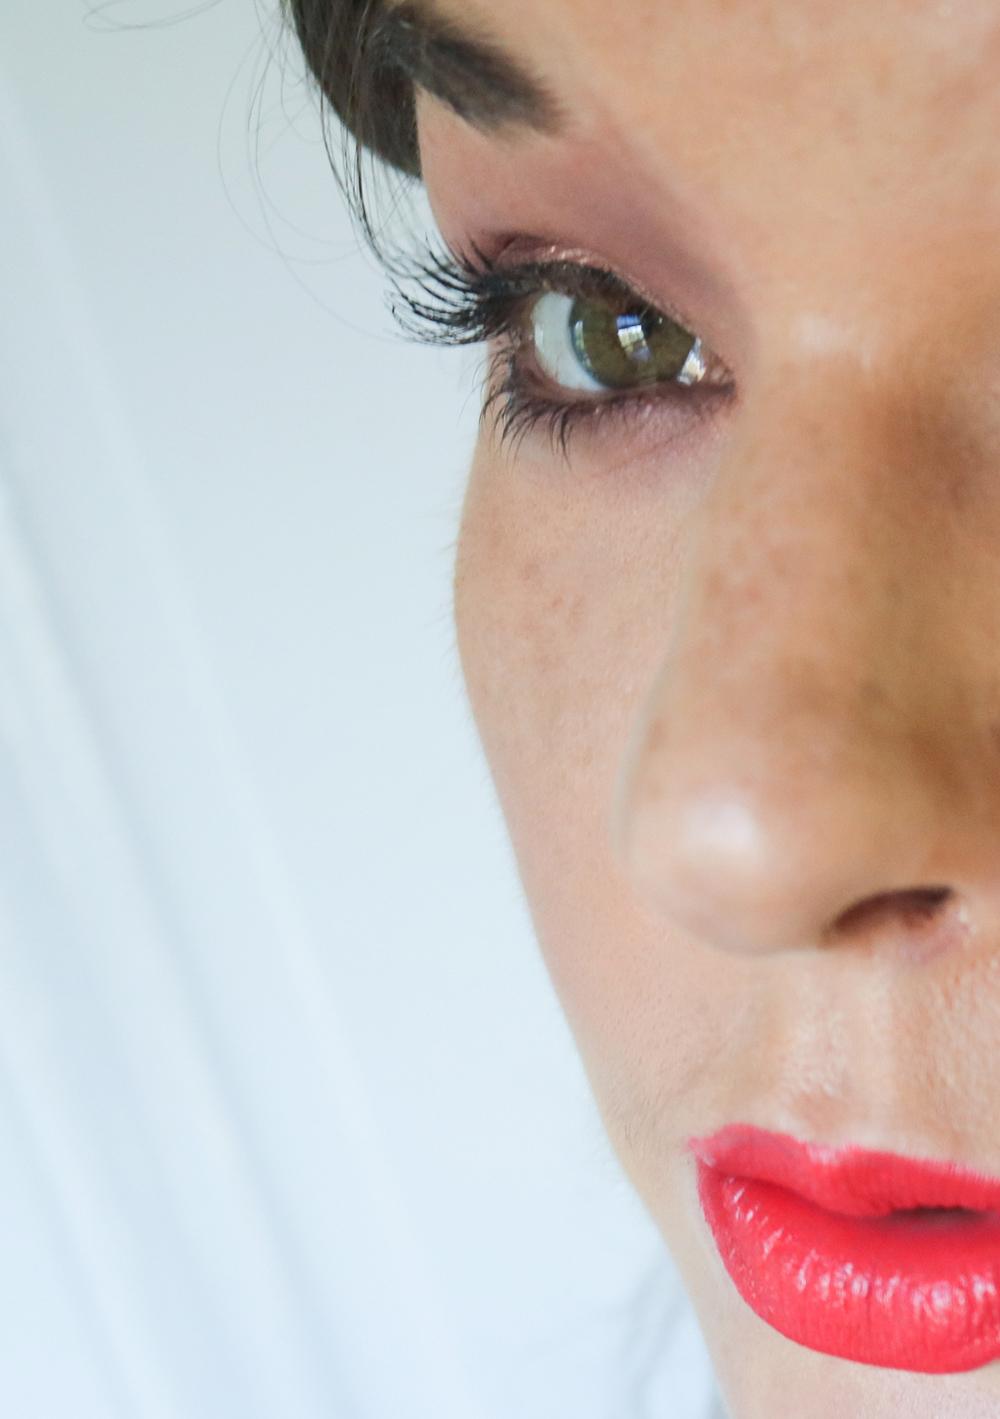 Rare Beauty Perfect Strokes Mascara Review I DreaminLace.com #makeupaddict #beautyblog